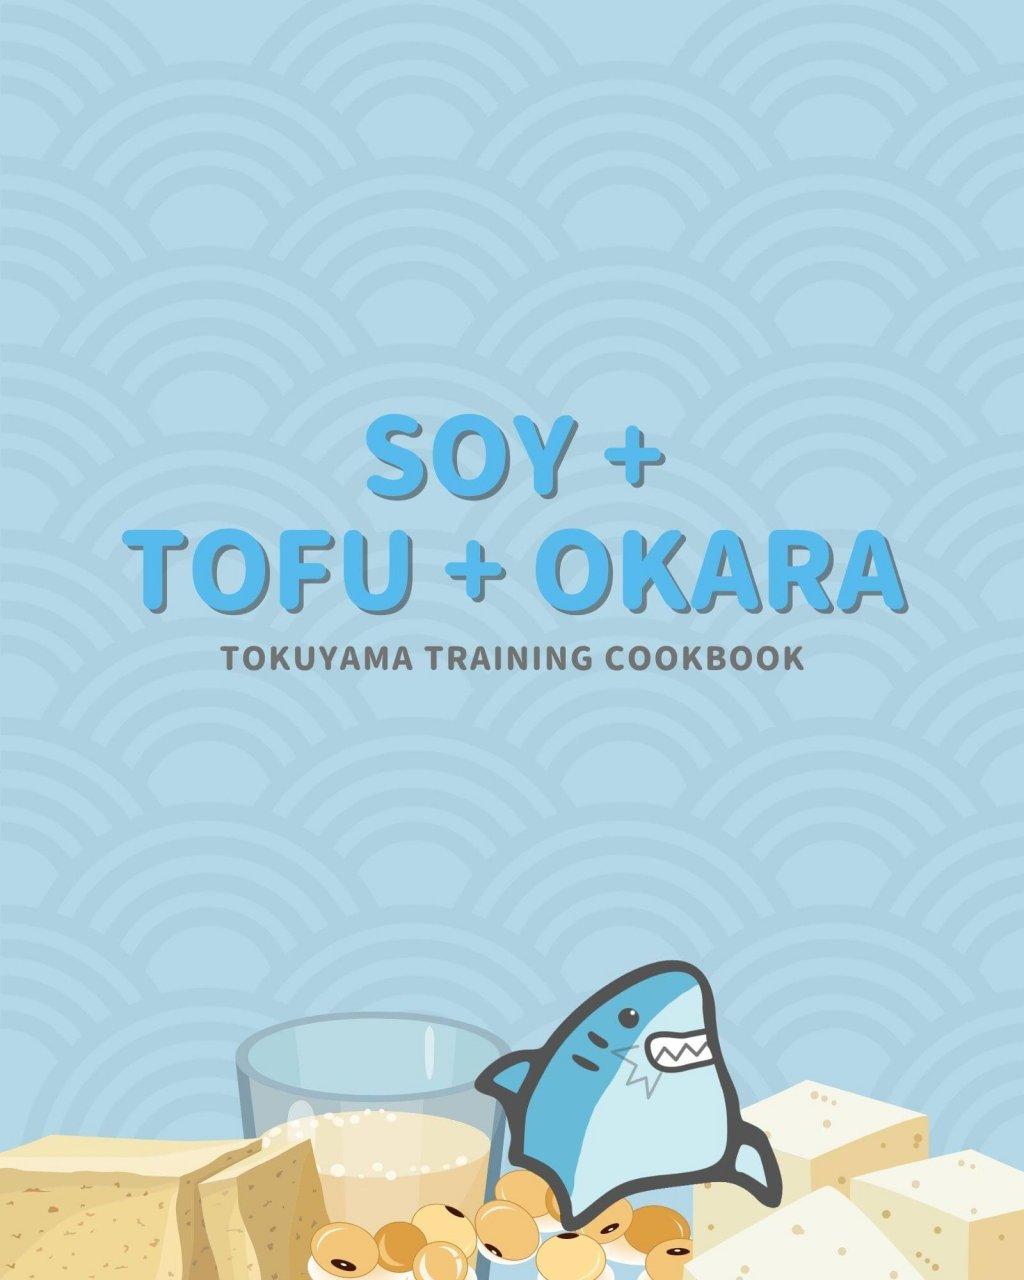 soy-tofu-okara-coookbook by pat tokuyama